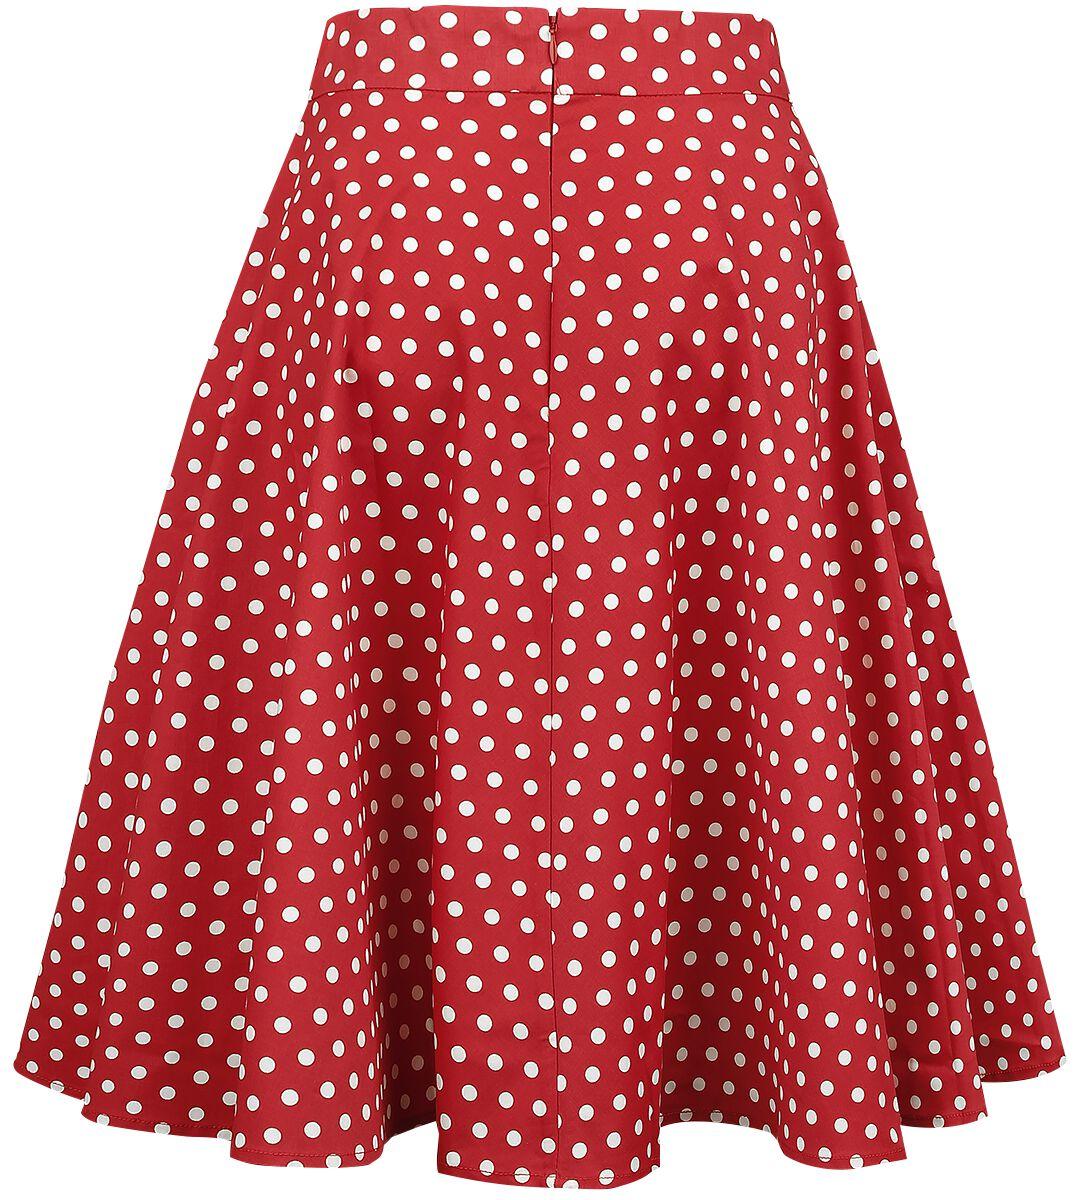 6f4973053e Shirley High Waist Full Circle Polka Dot Skirt | Dolly and Dotty ...